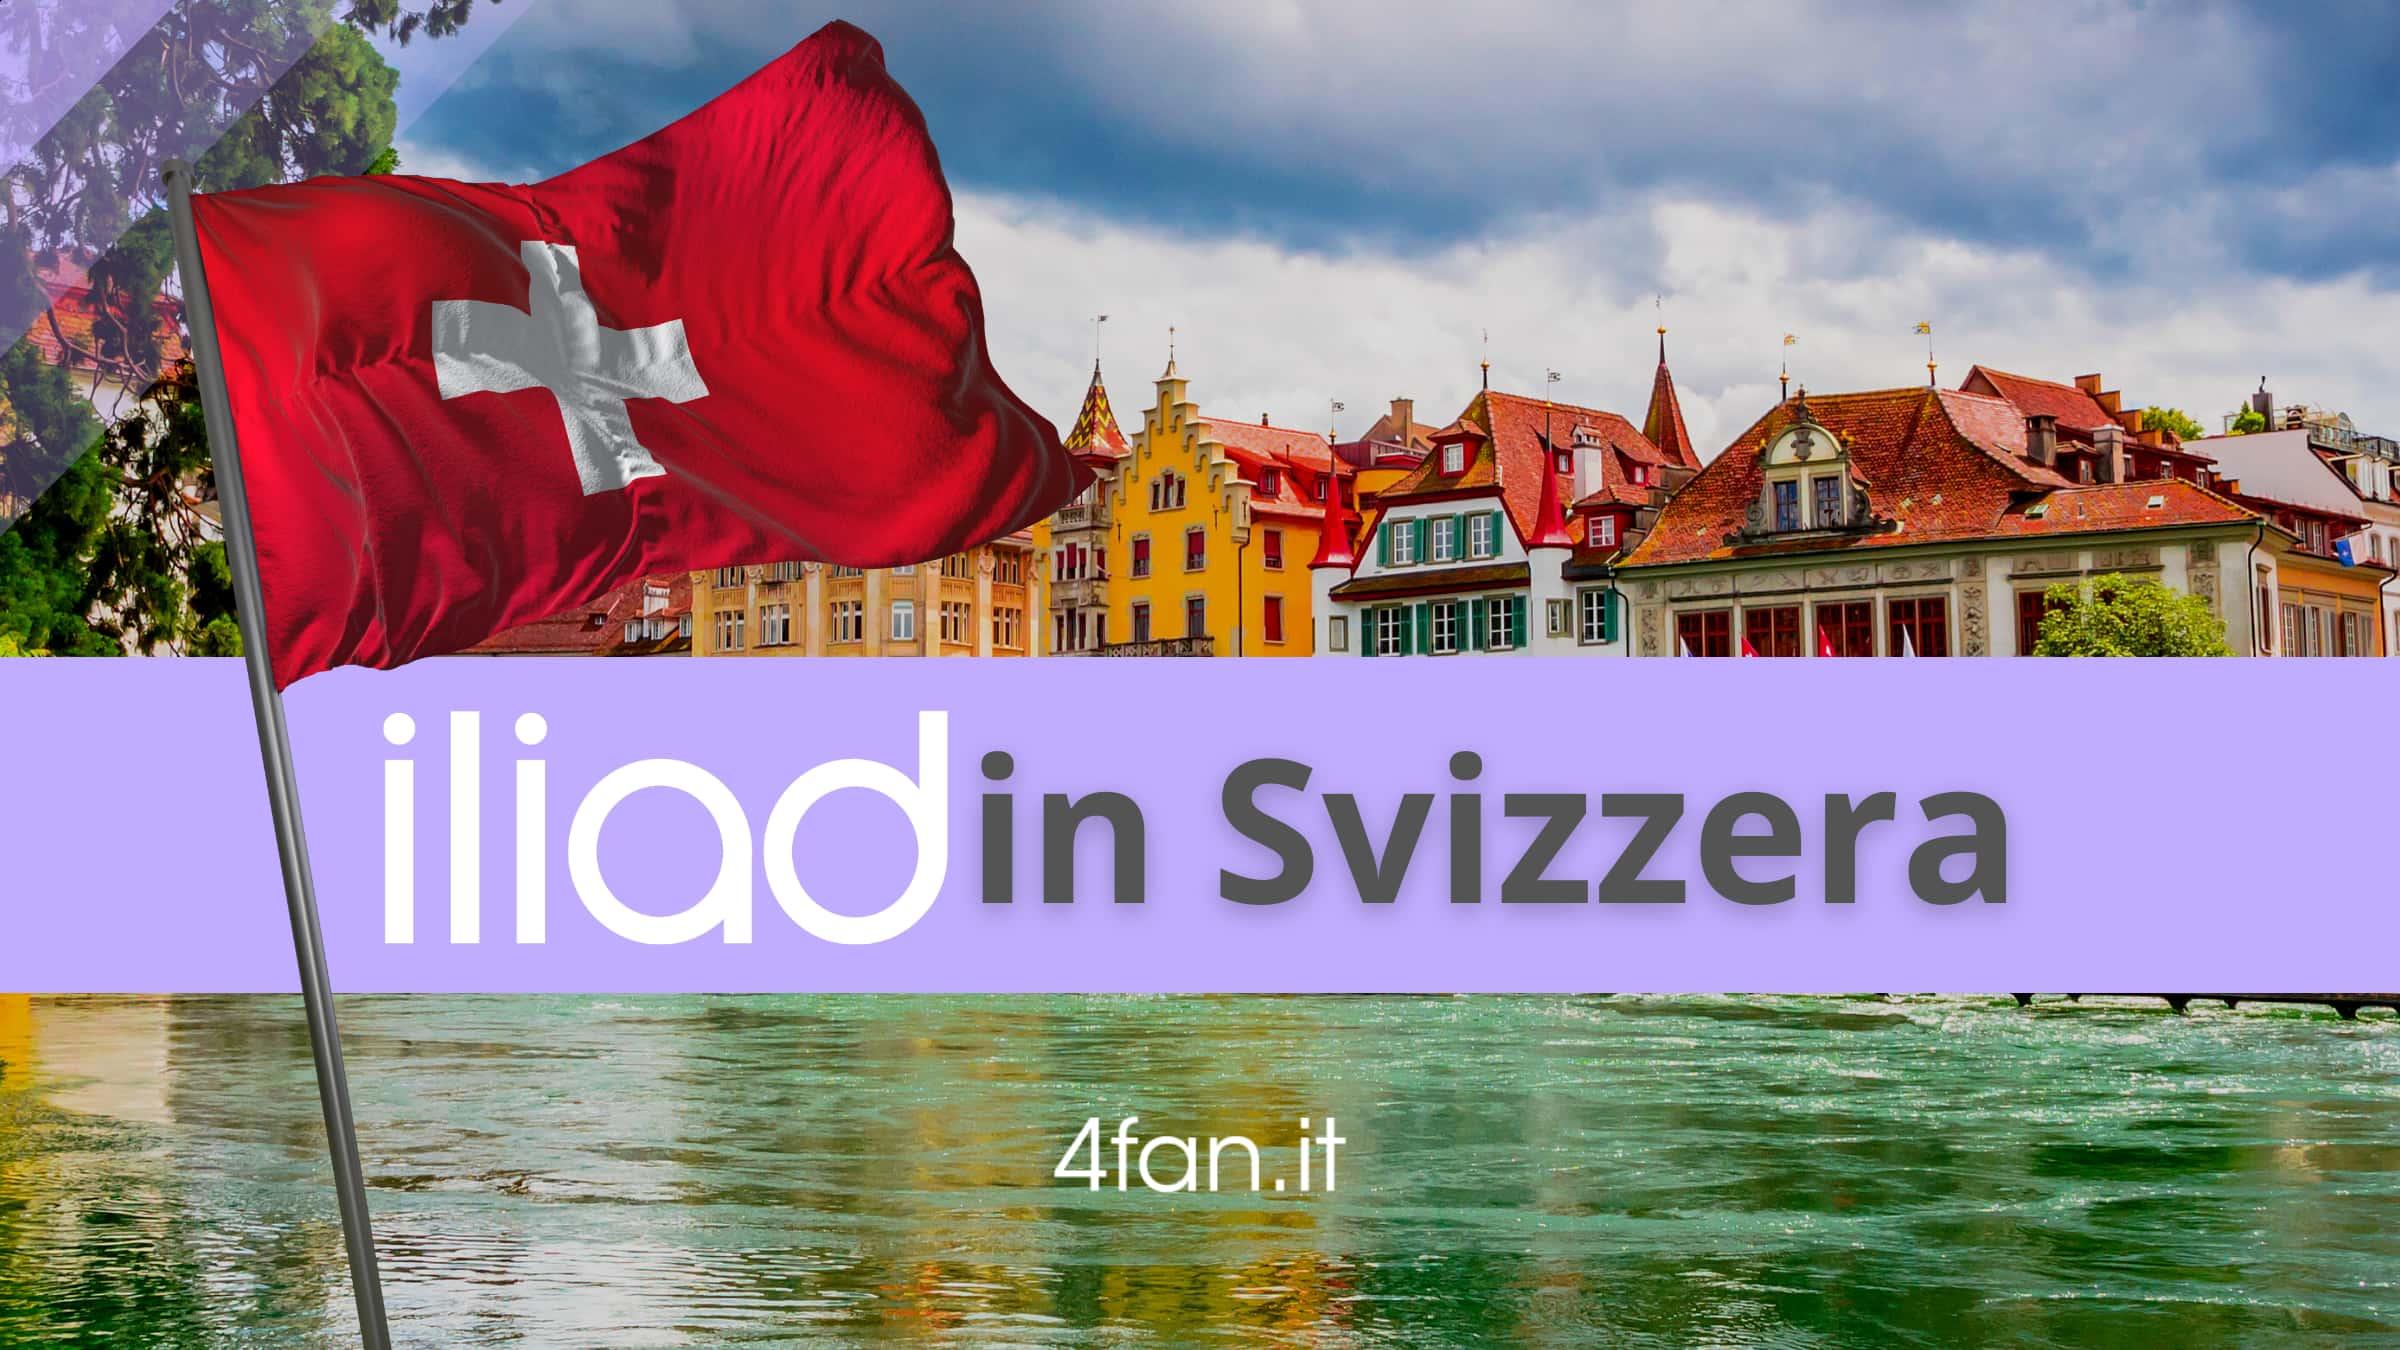 Iliad in Svizzera